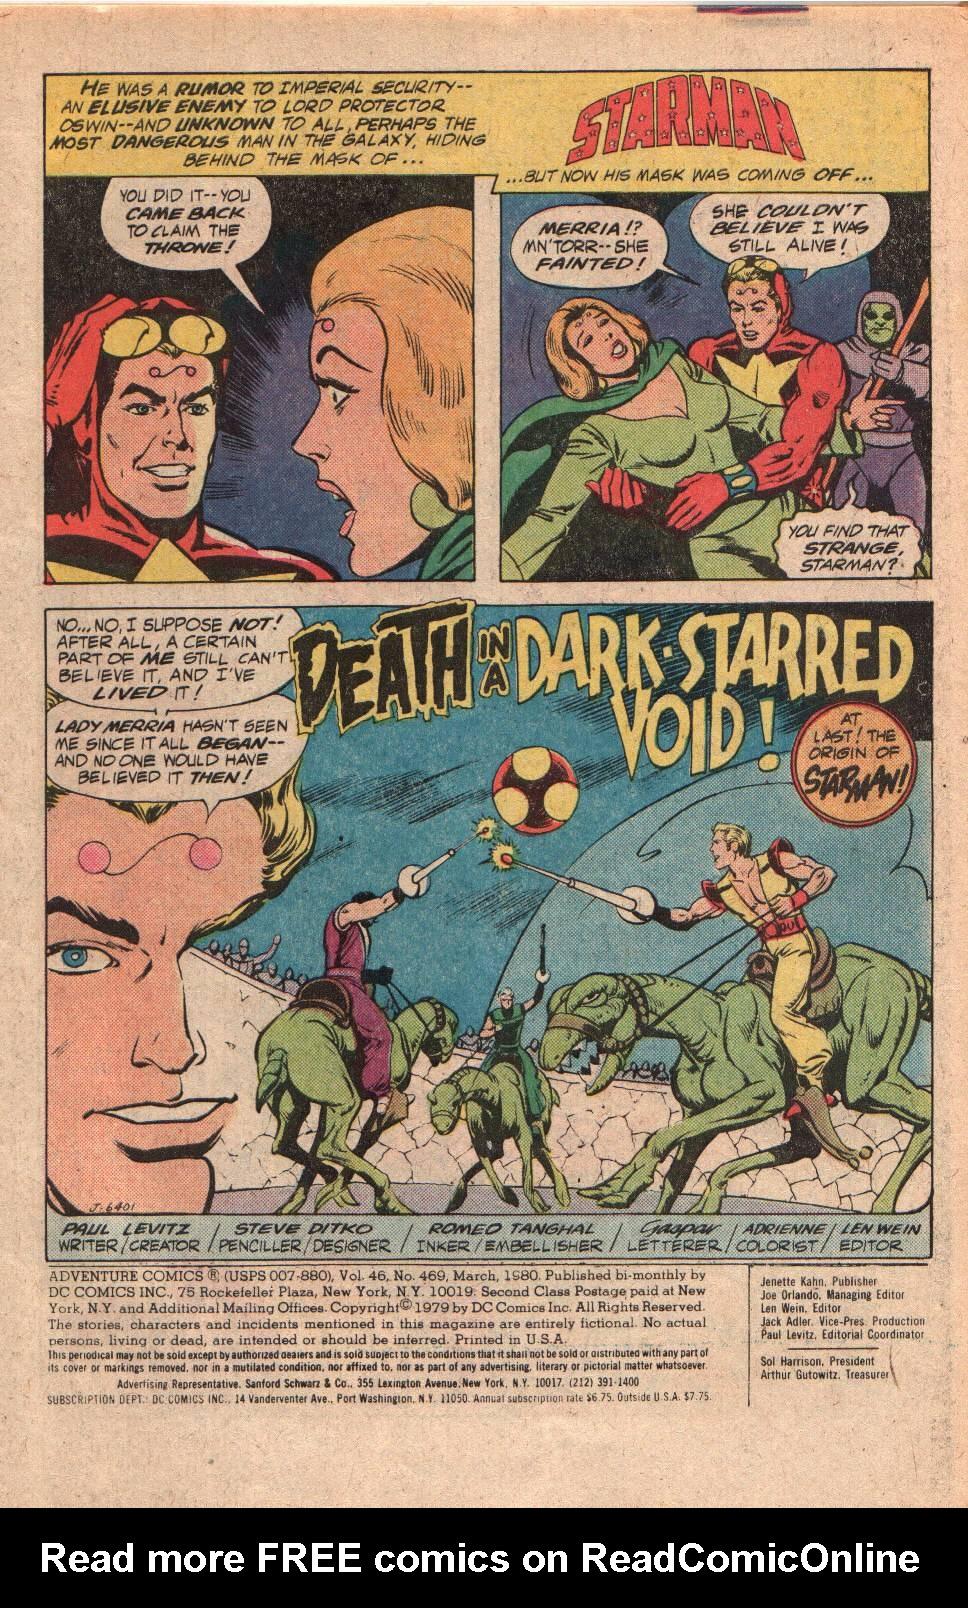 Read online Adventure Comics (1938) comic -  Issue #469 - 3